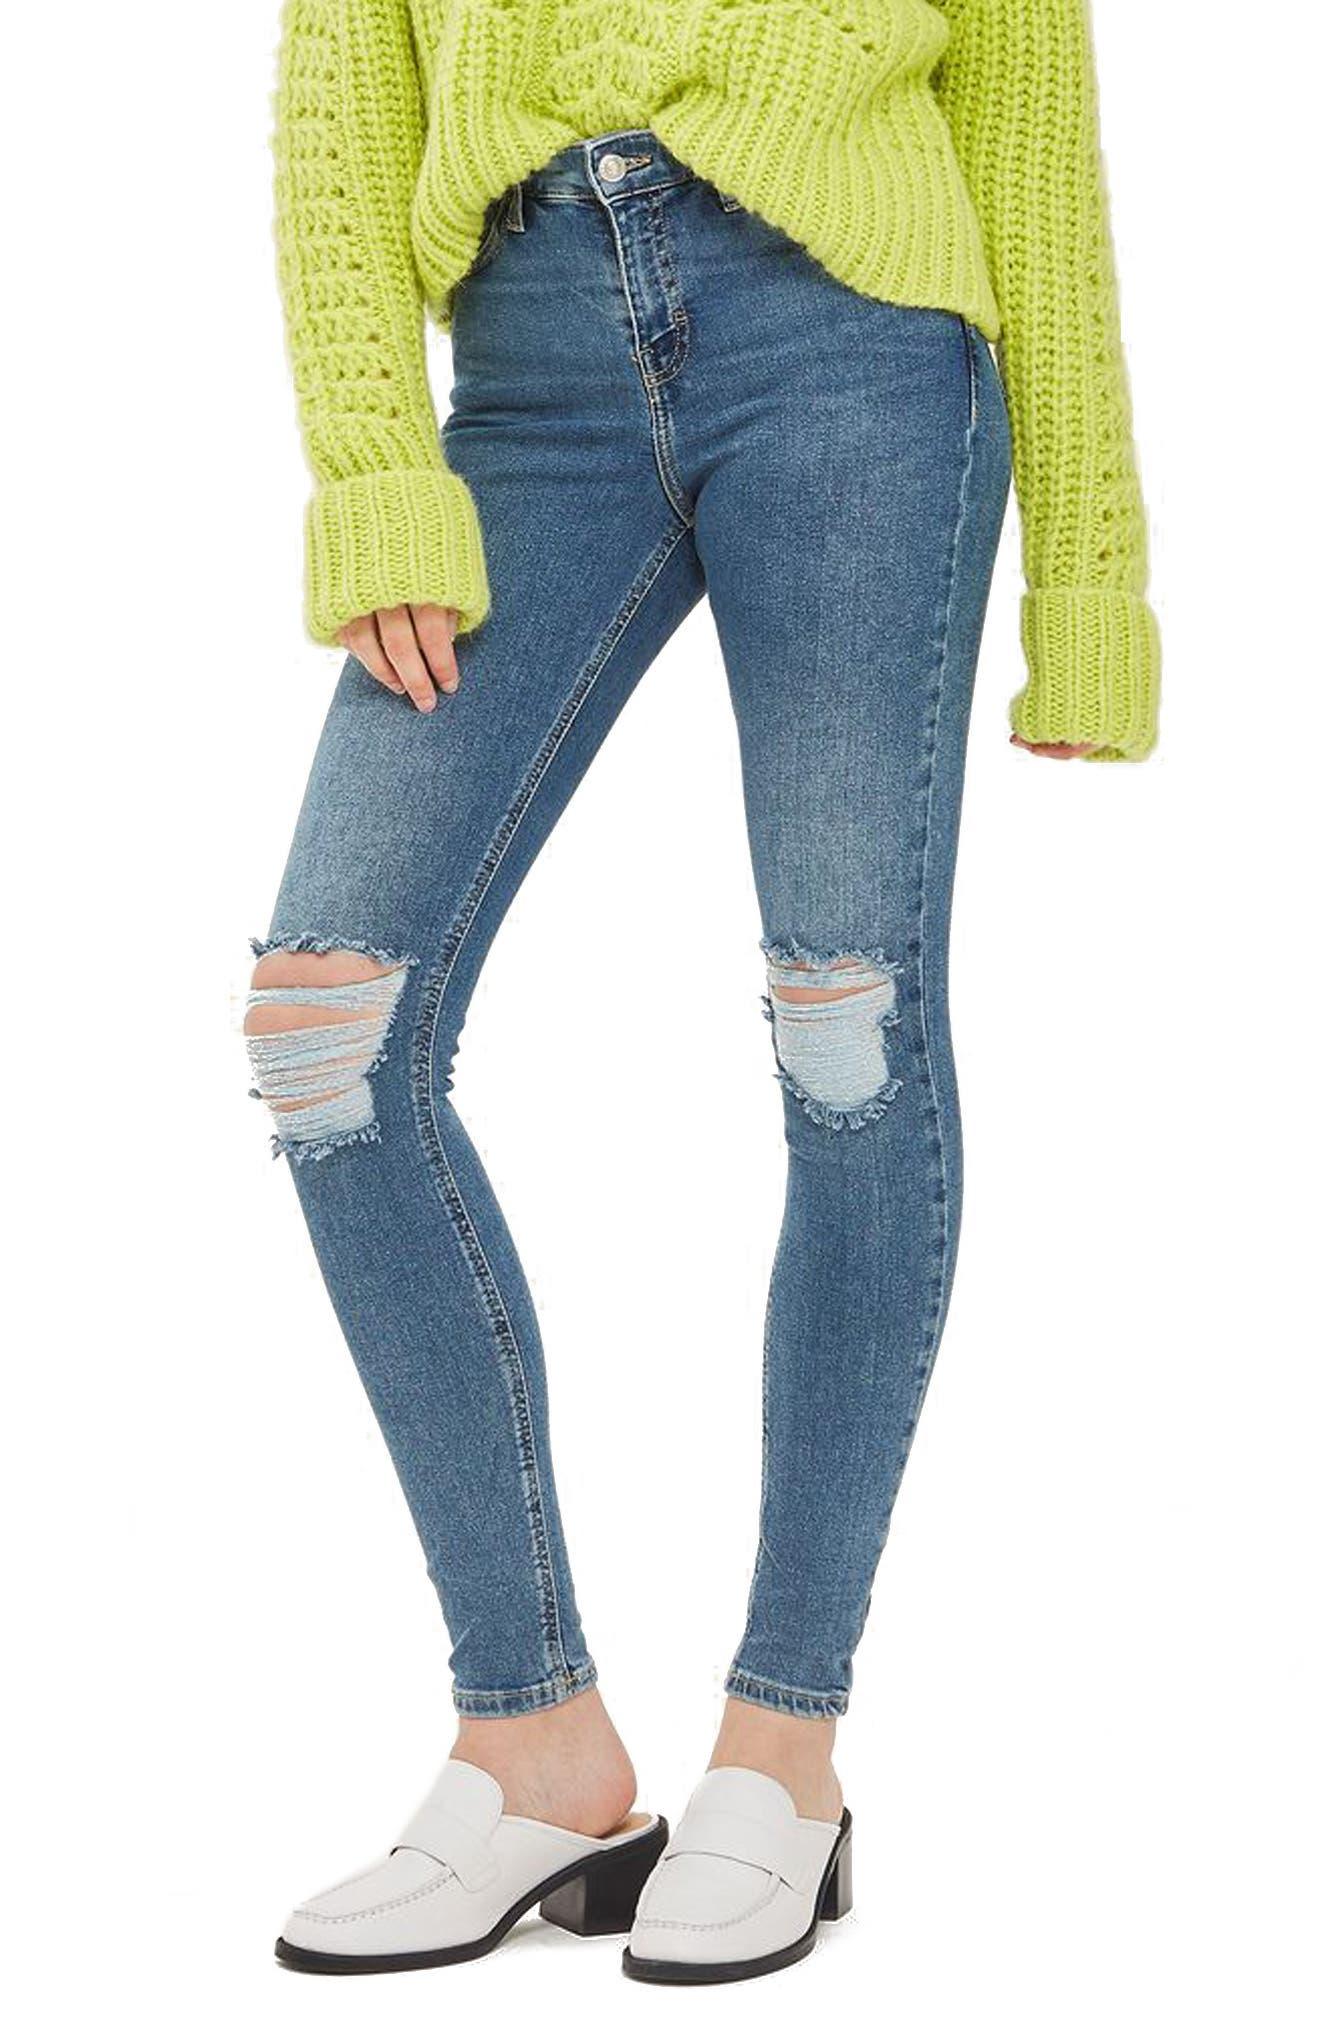 Jamie Rip High Waist Skinny Jeans,                             Main thumbnail 1, color,                             Mid Denim